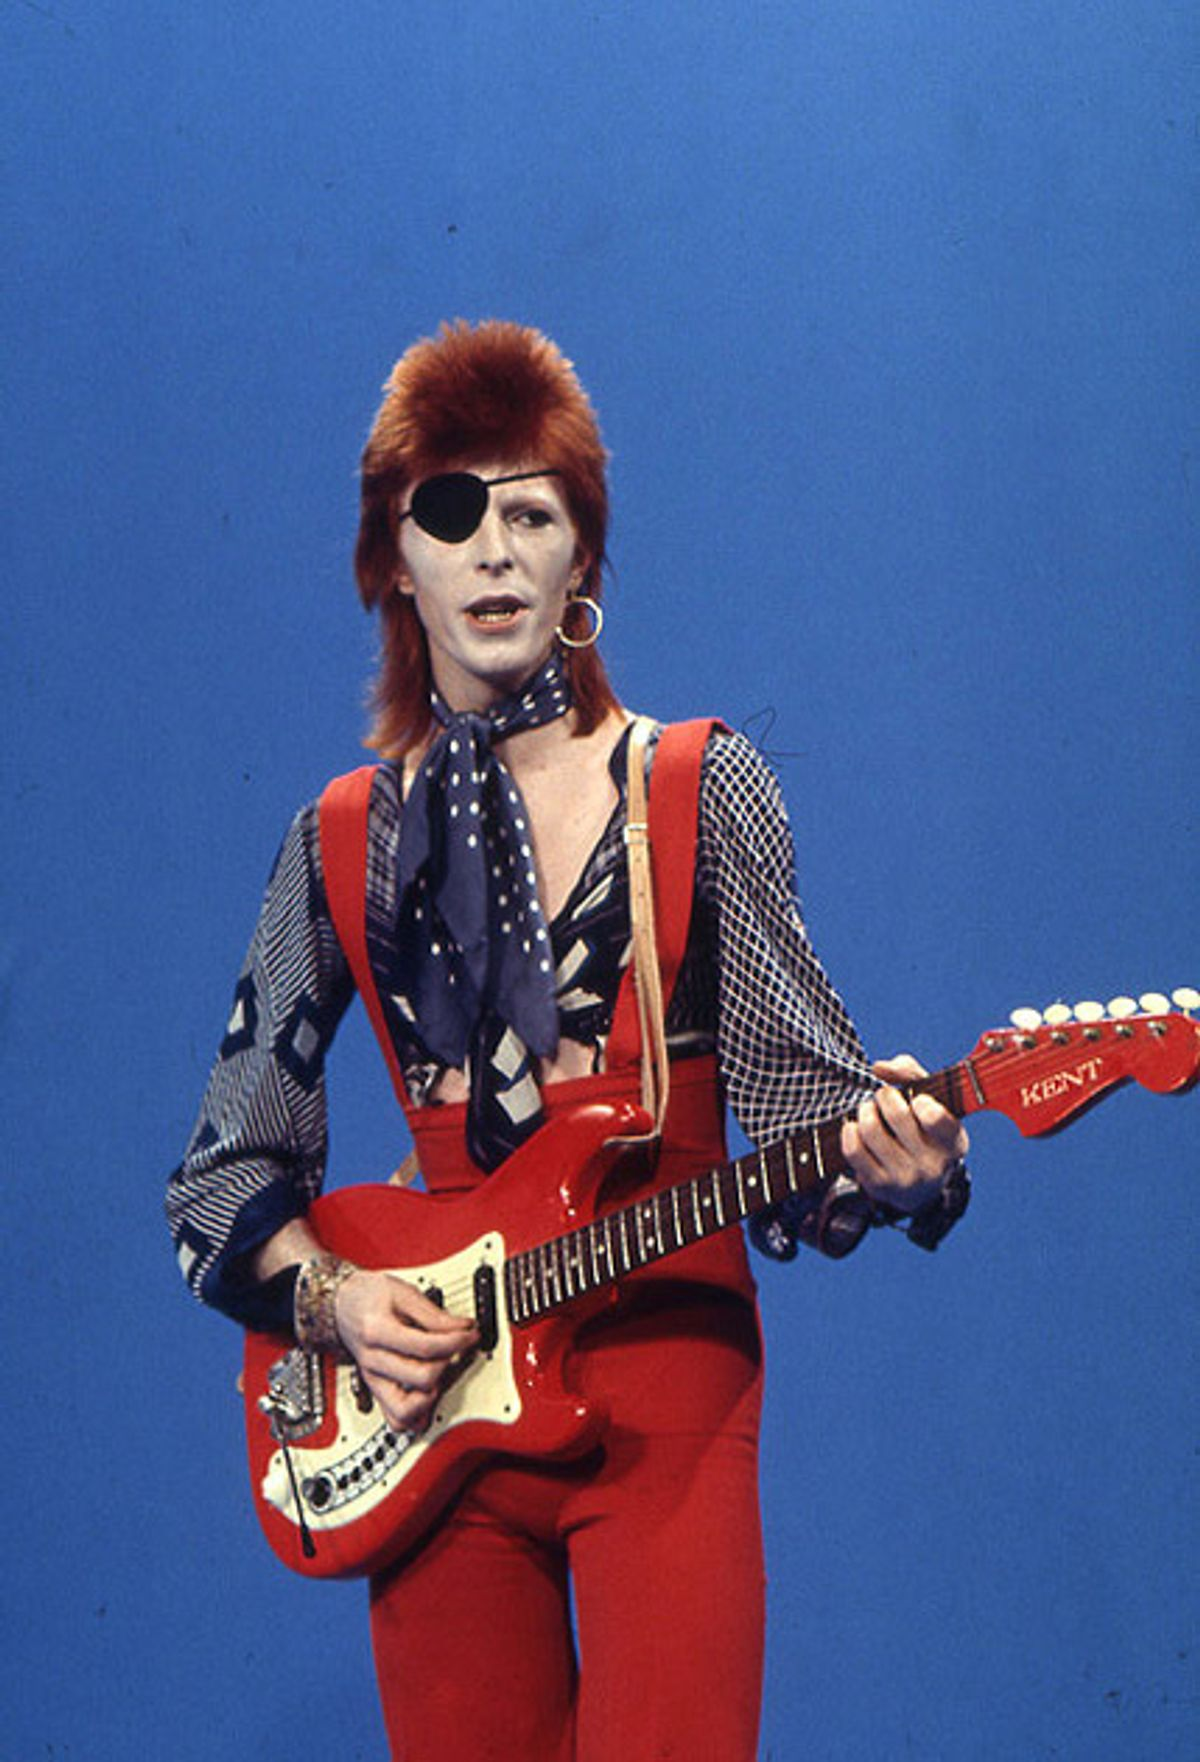 David Bowie: 1947–2016